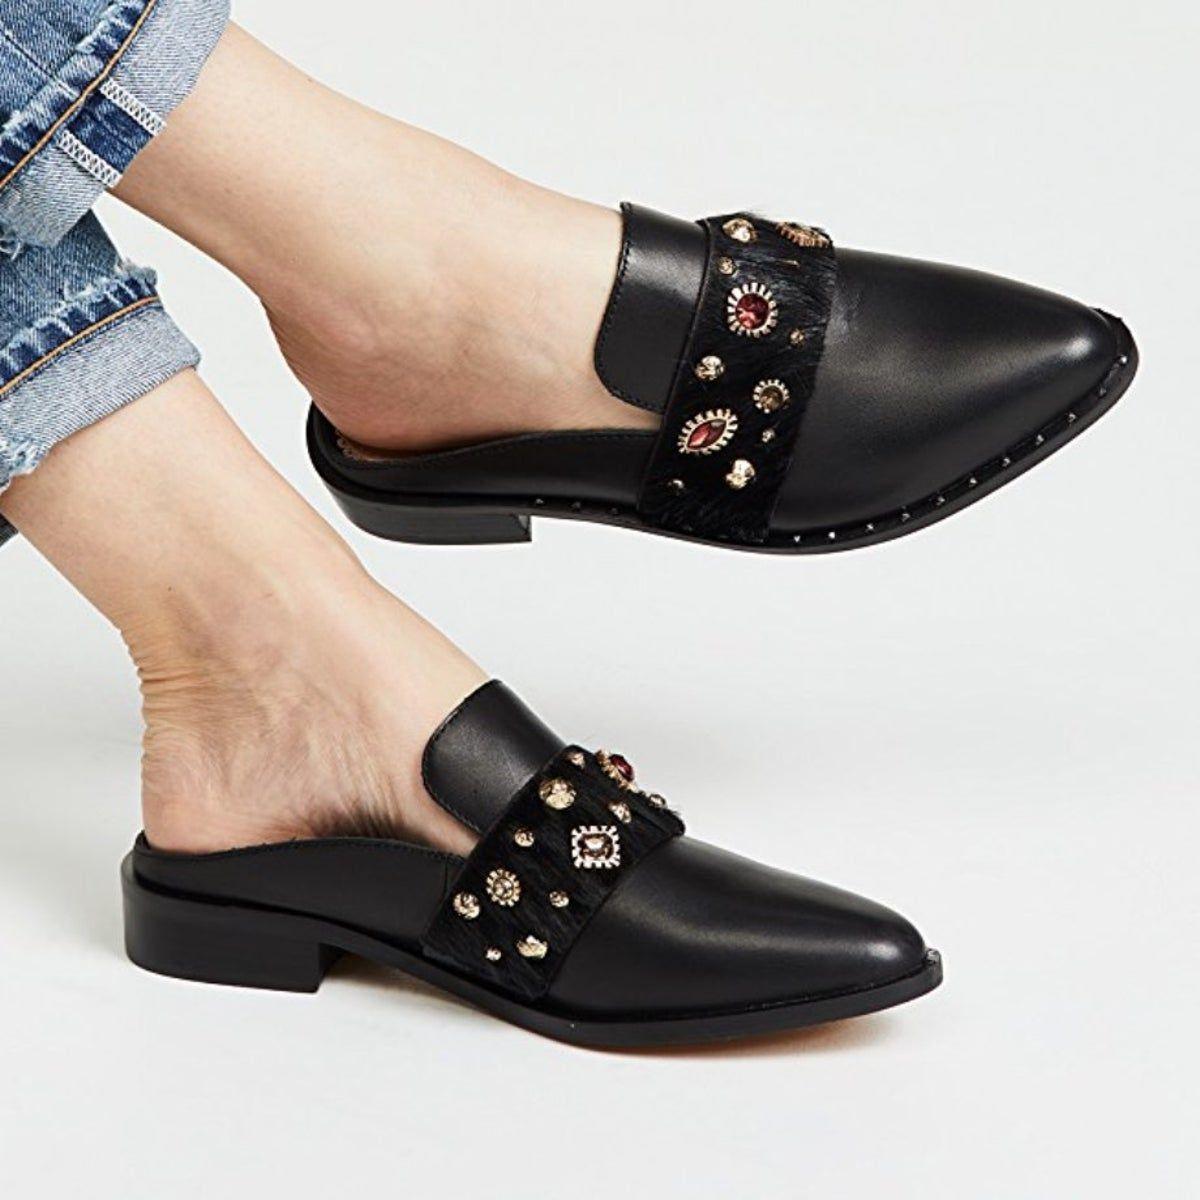 Leather mules, Sam edelman shoes